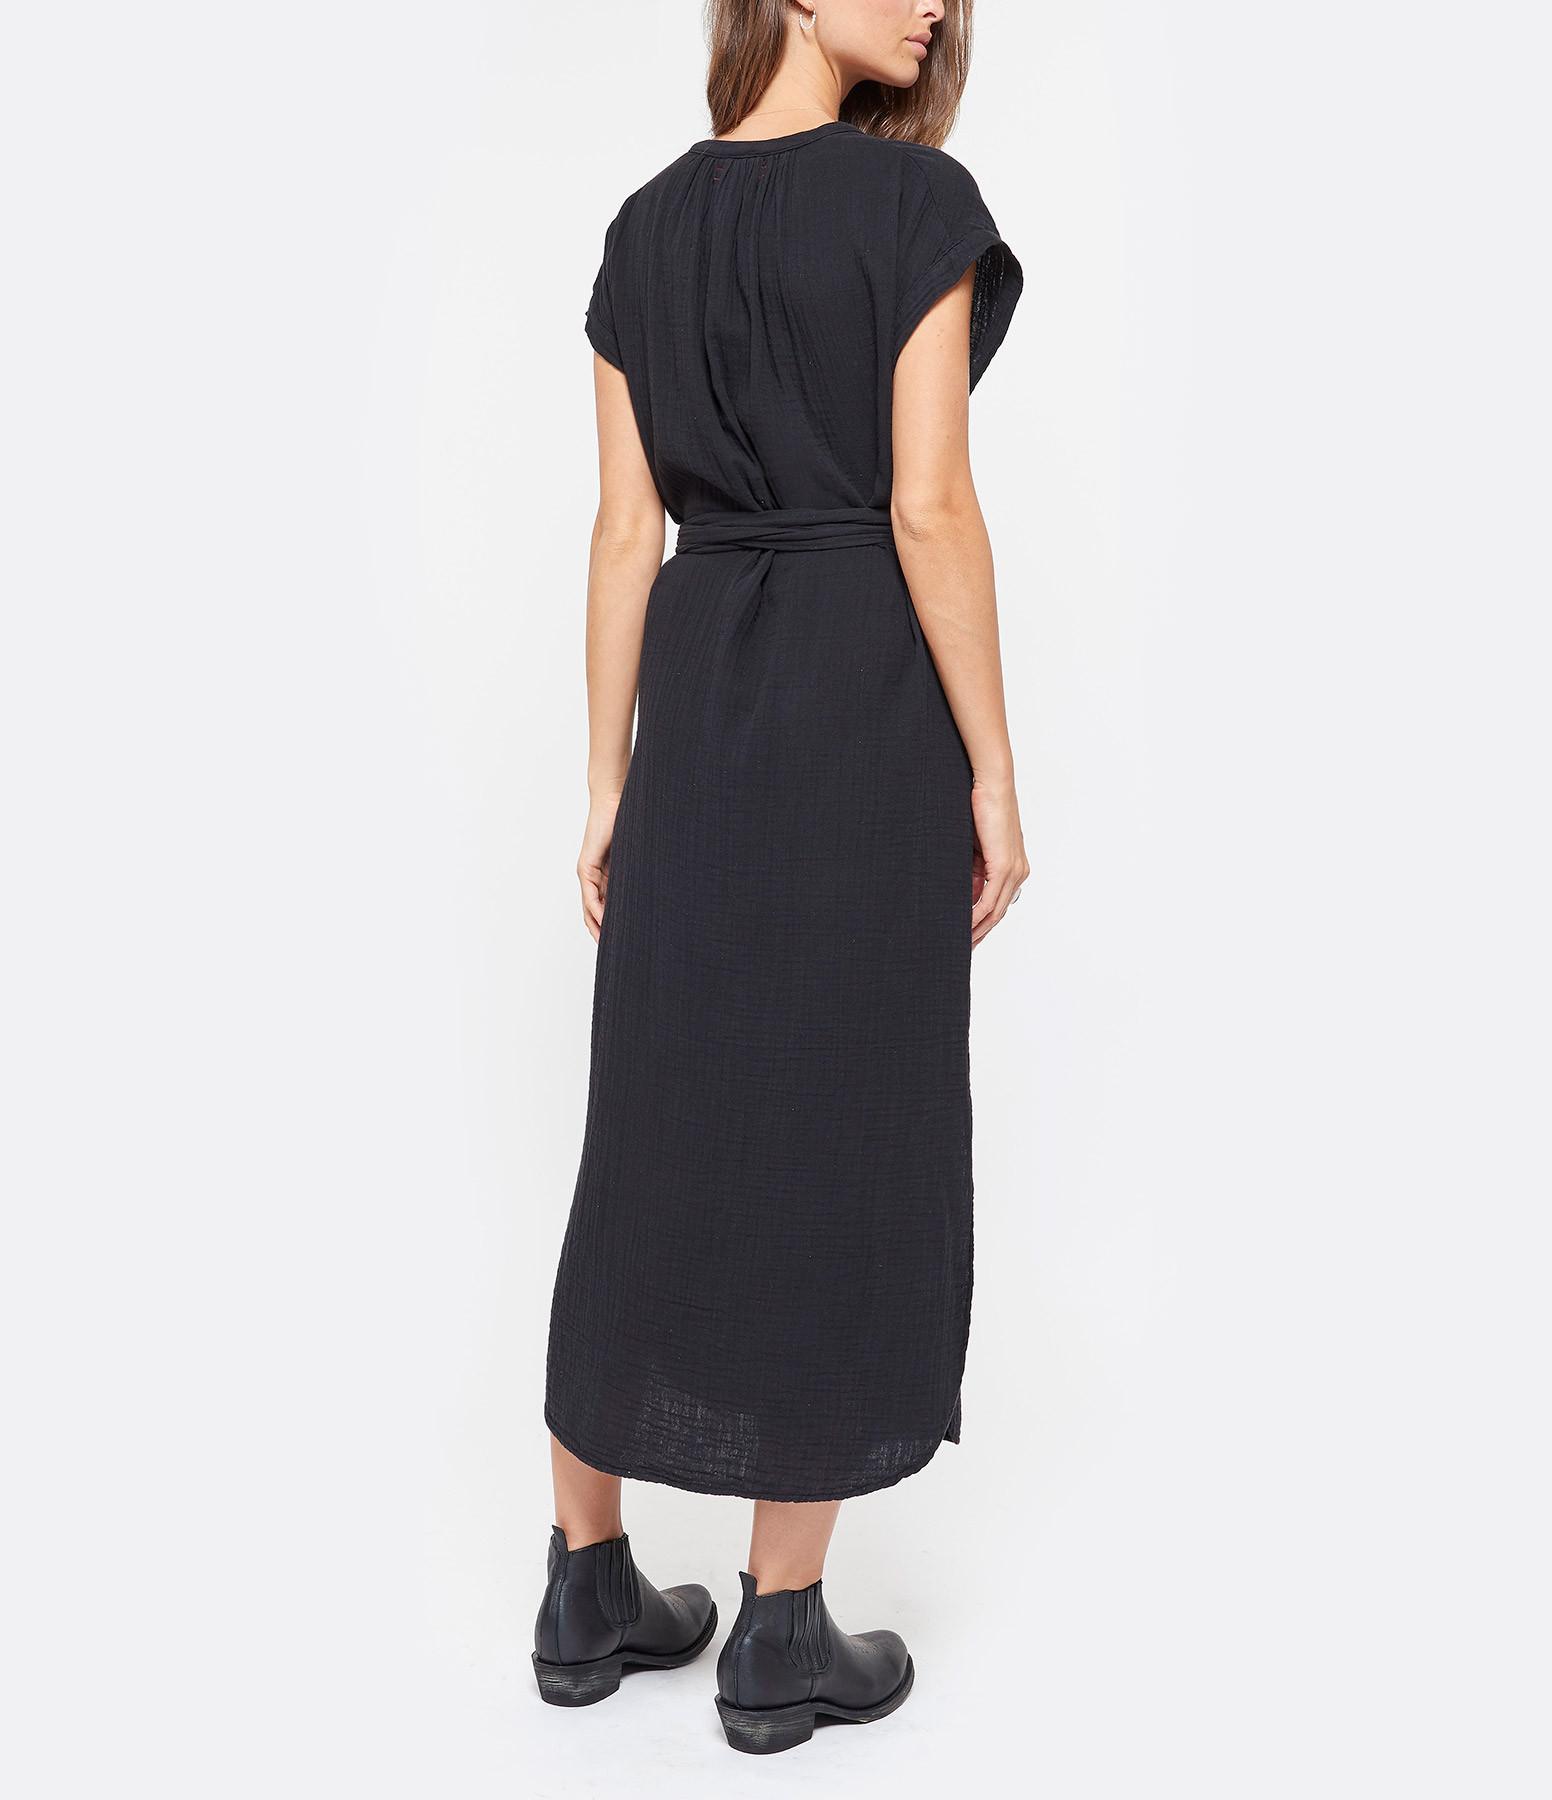 XIRENA - Robe Samantha Noir